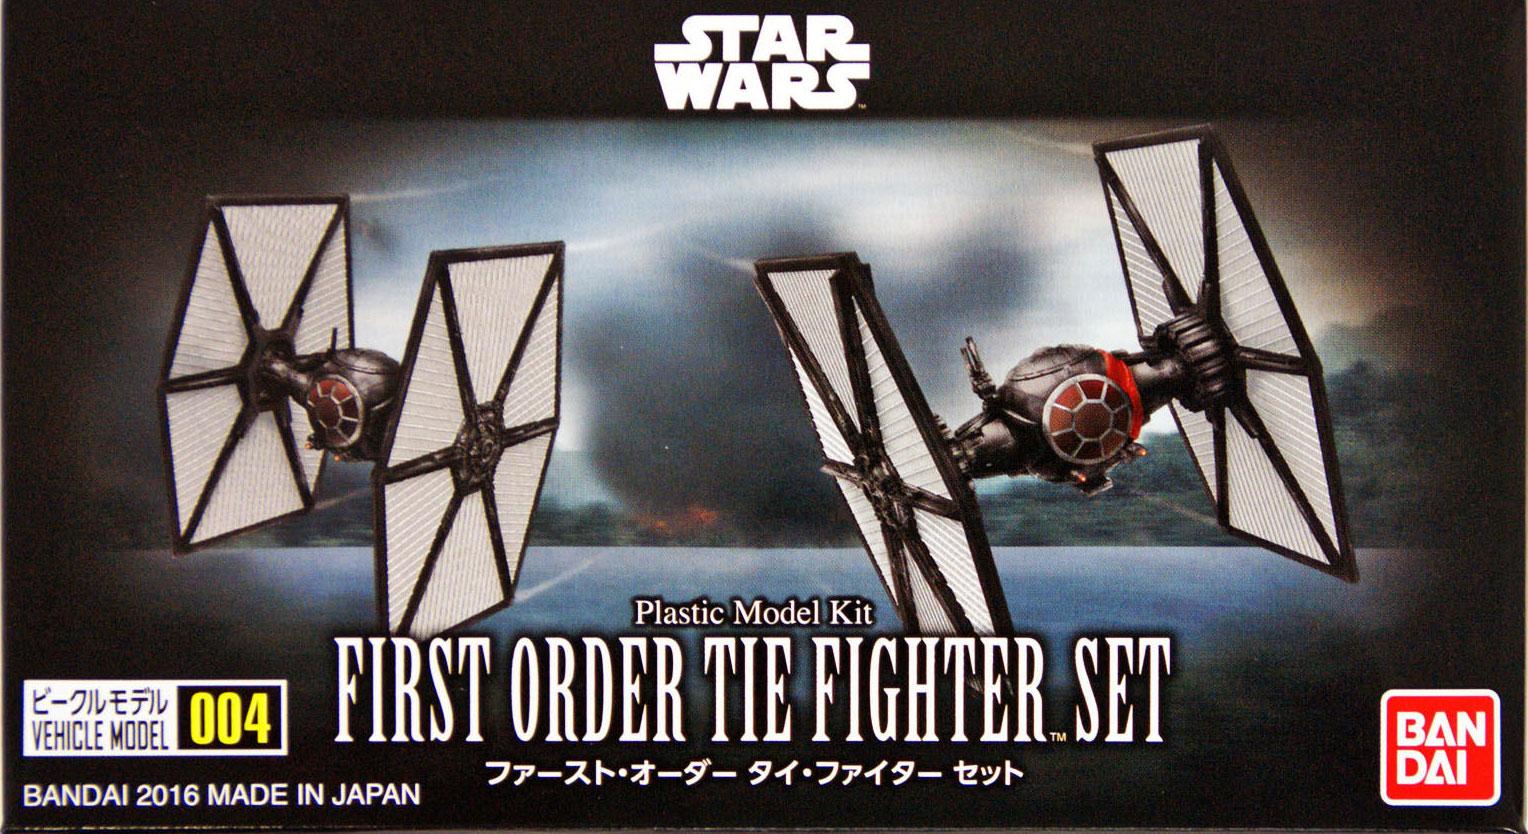 [Star Wars] Vehicle Model 004 First Order Tie Fighter Set